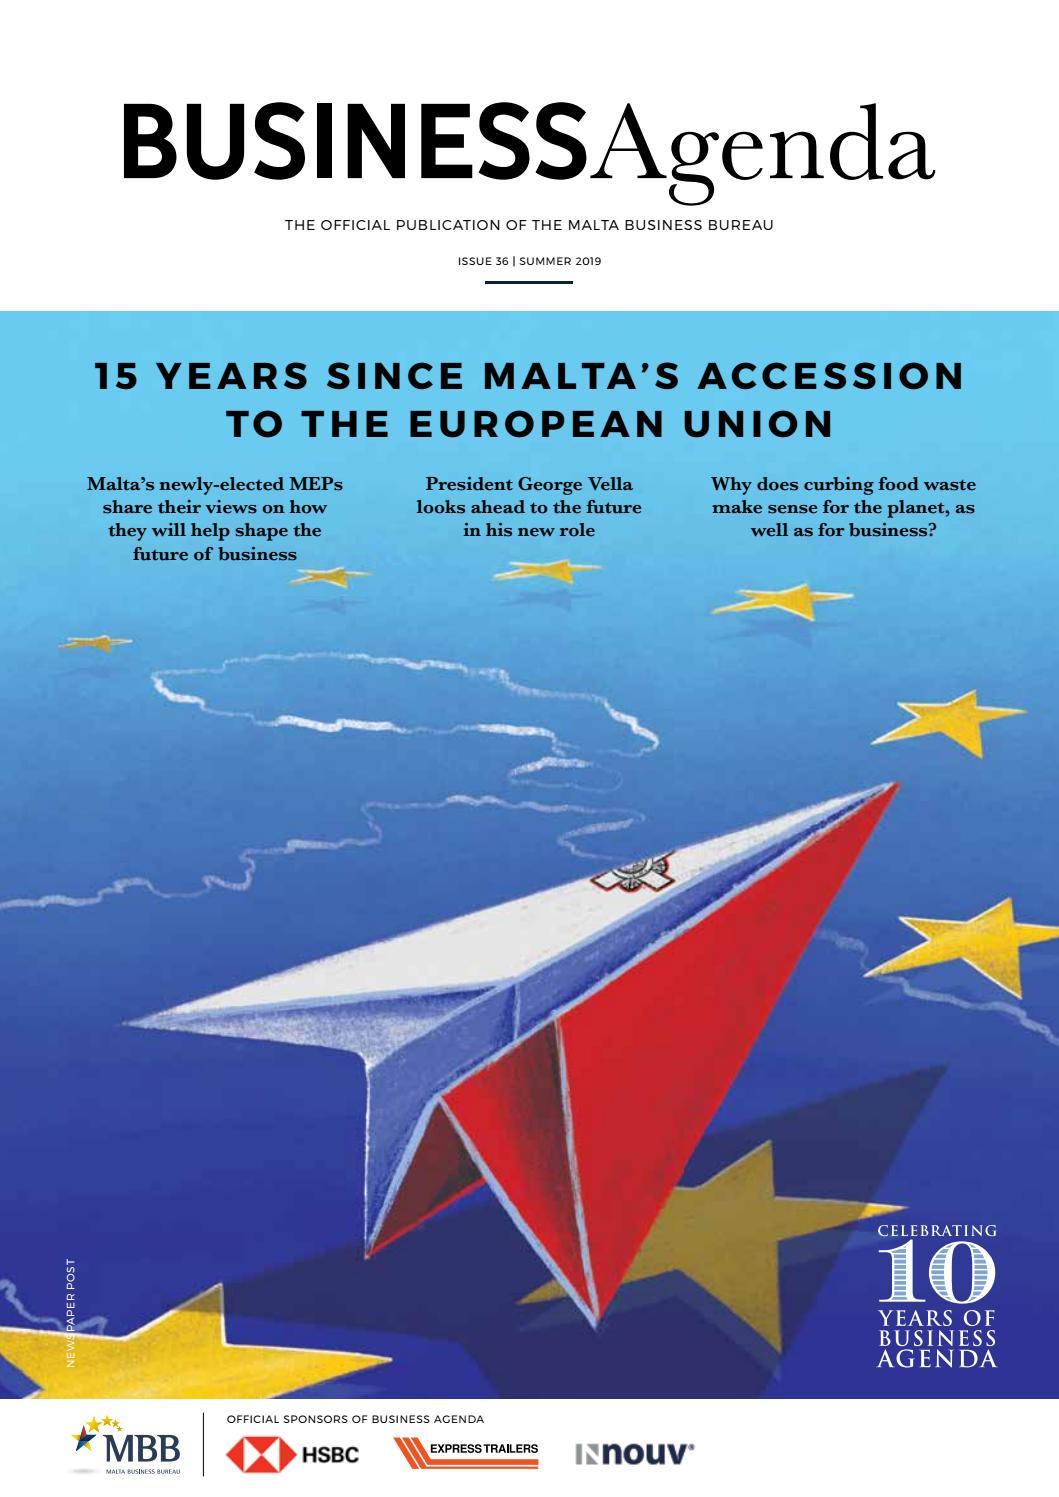 Business Agenda Issue 36 by Malta Business Bureau - issuu